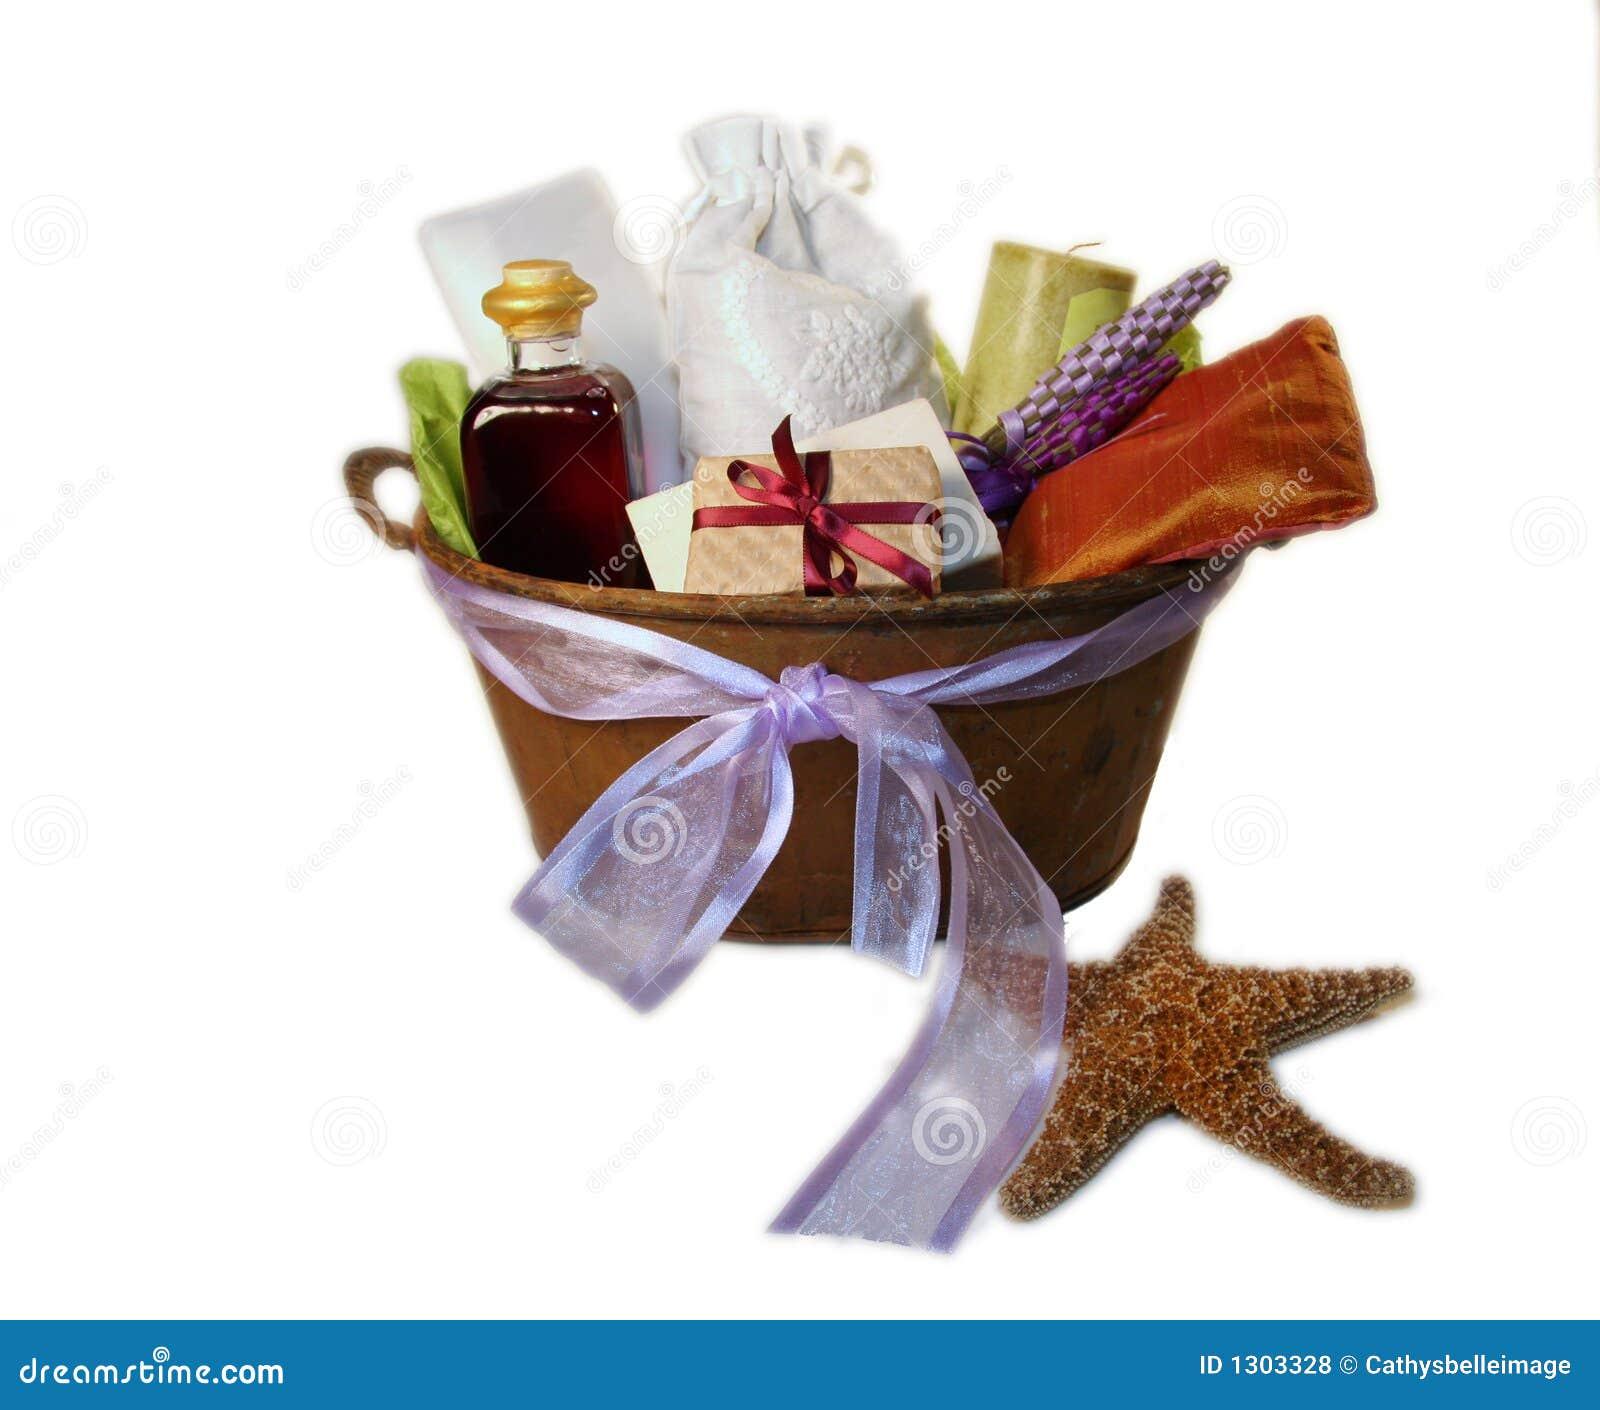 Spa Gift Basket Royalty Free Stock Photos Image 1303328